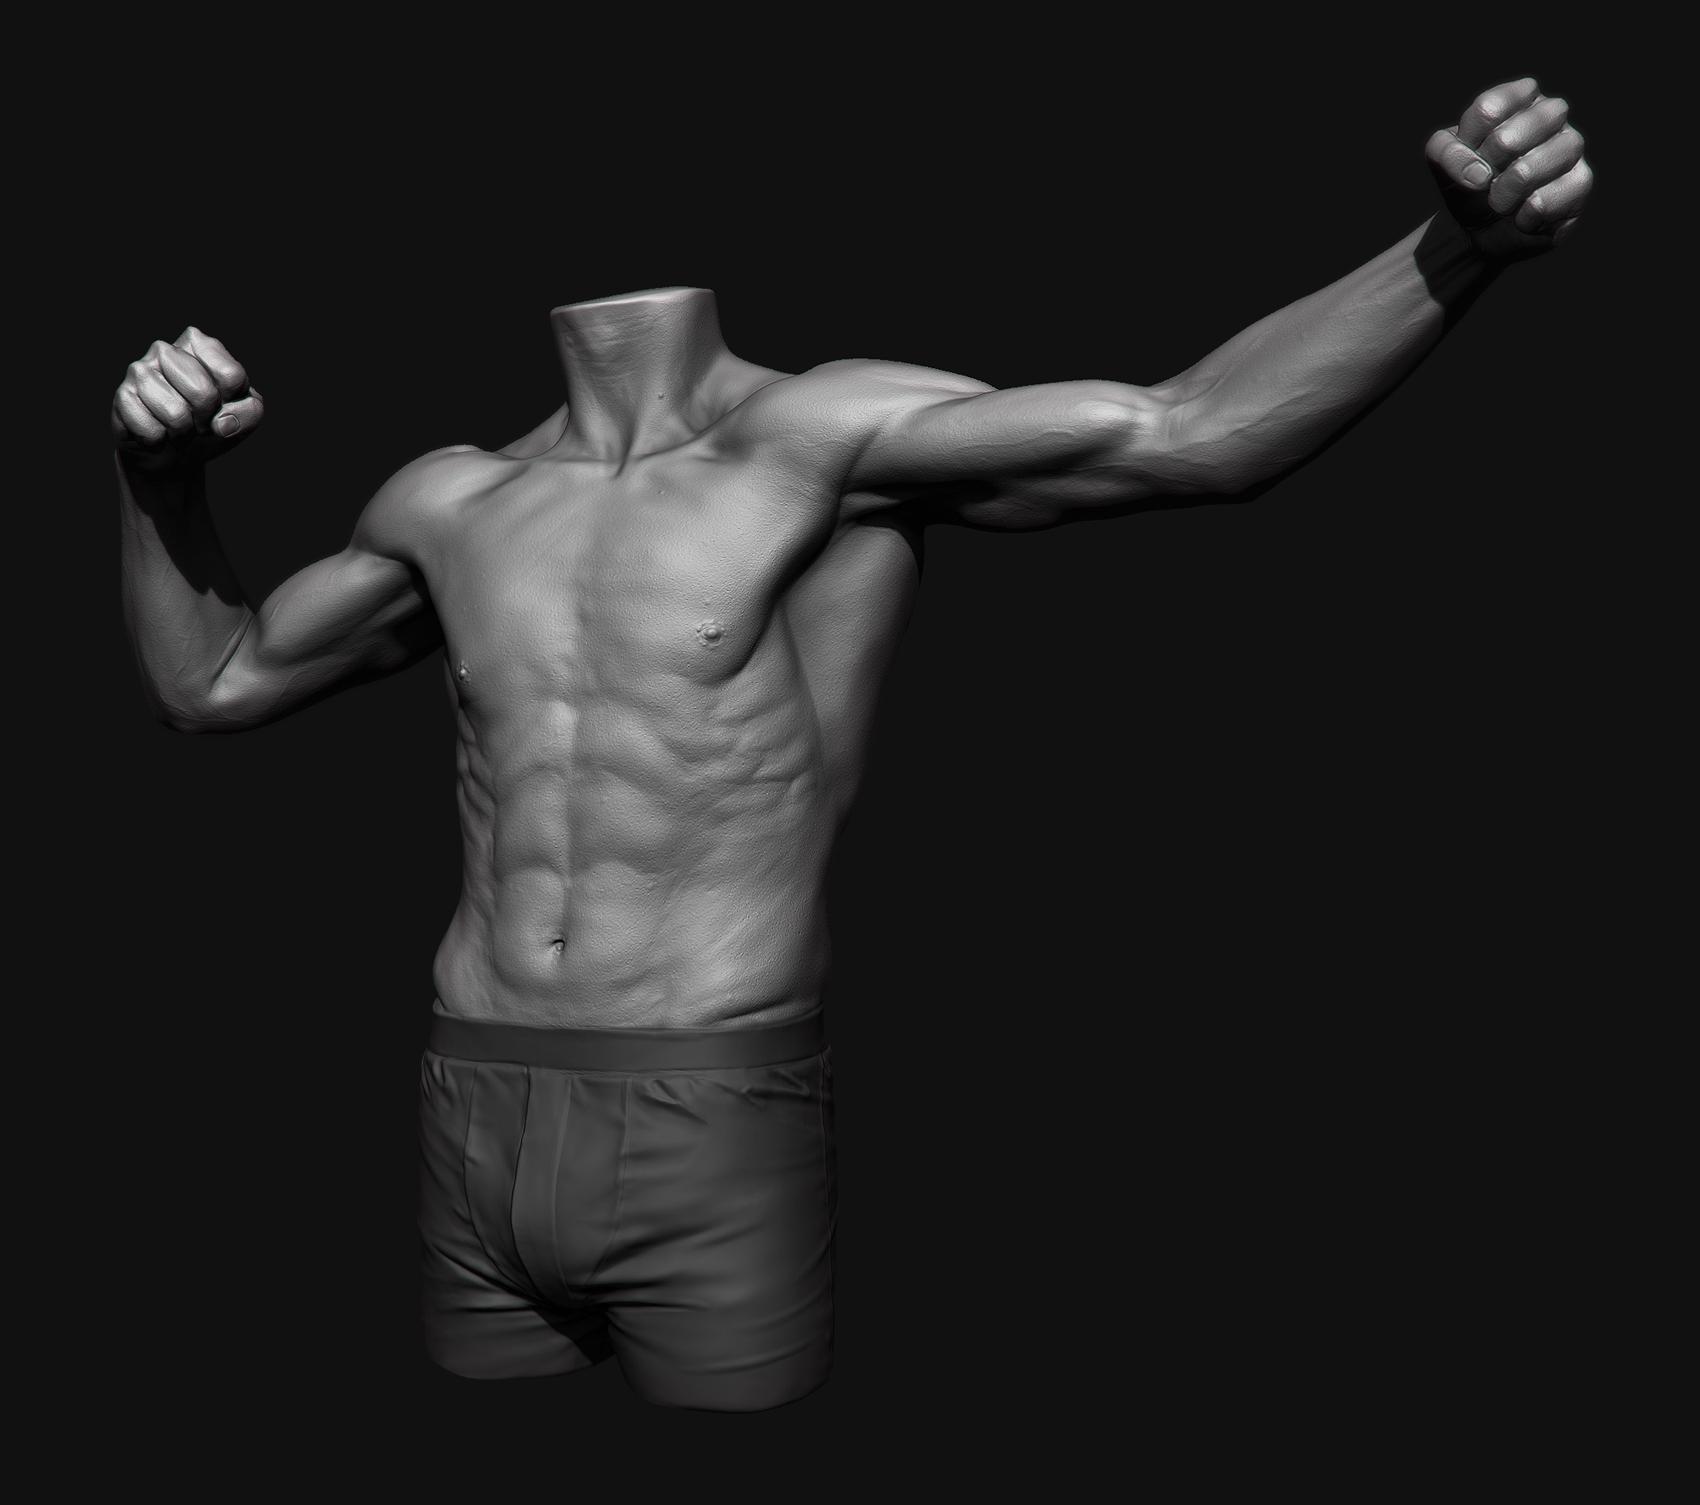 anatomy_study_main_mid_res.jpg